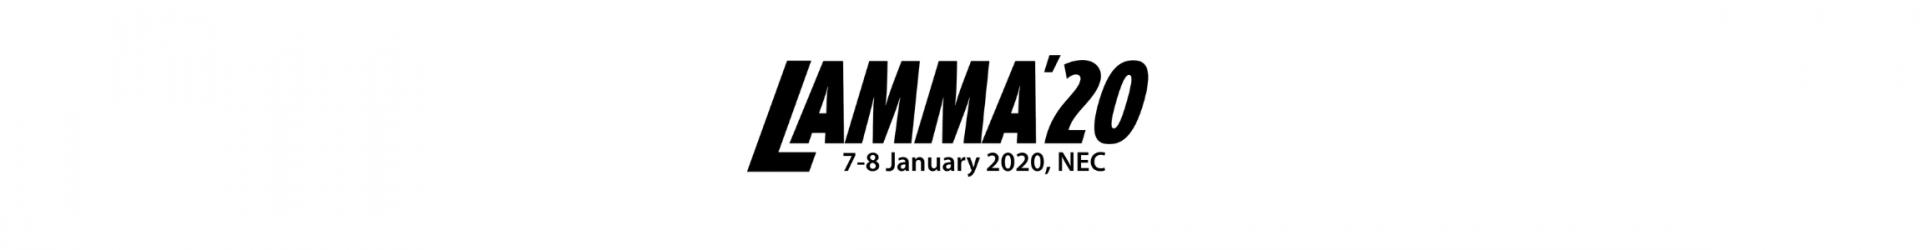 LAMMA 2020 Logo